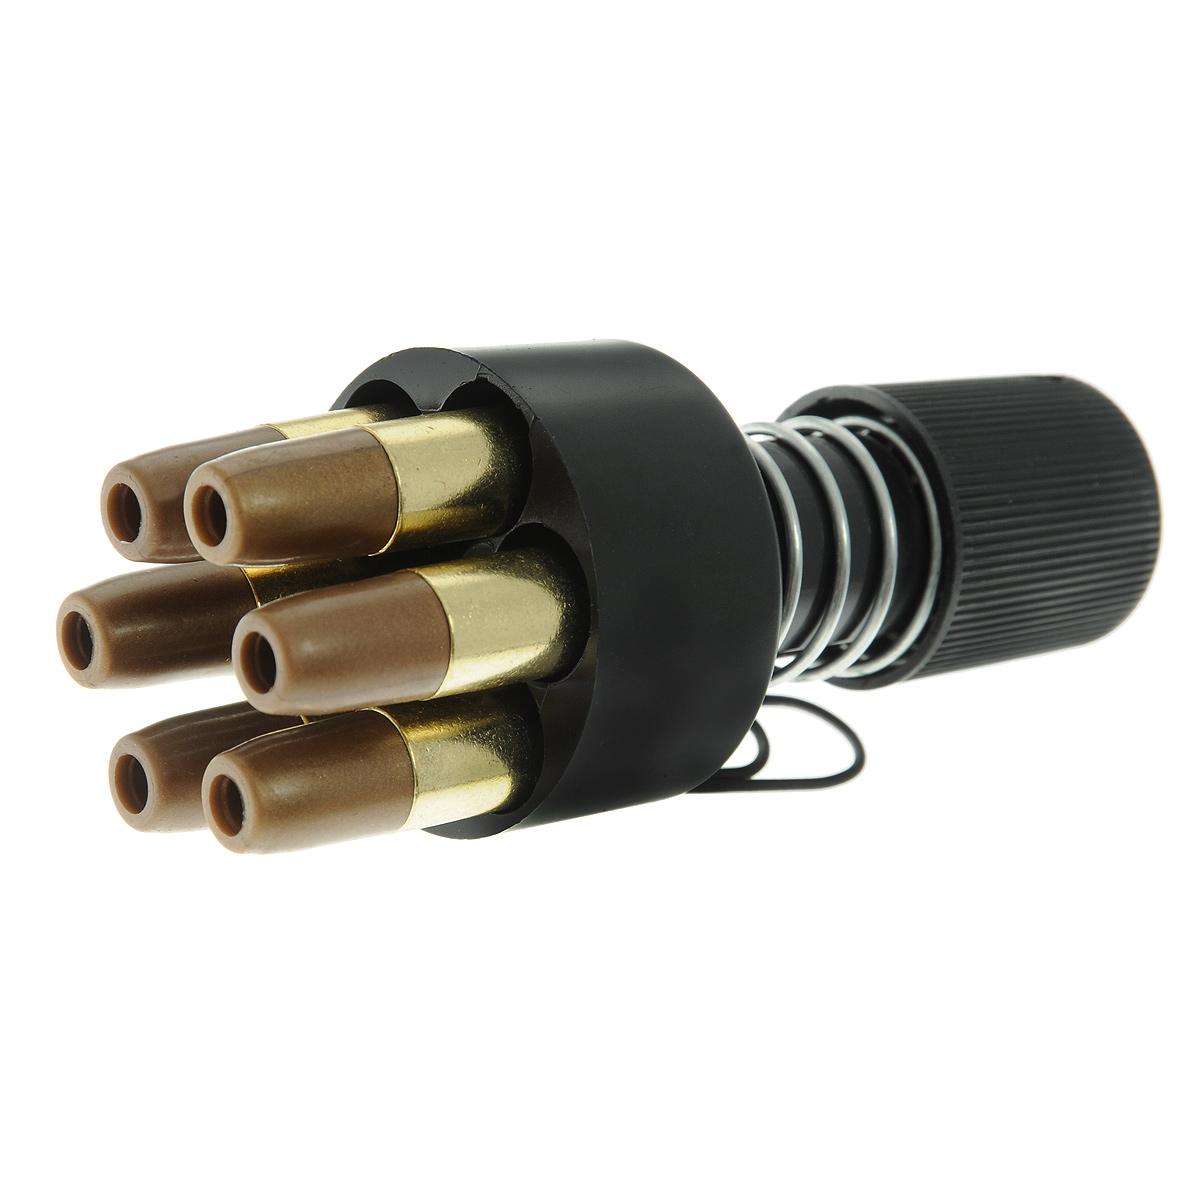 ASG Dan Wesson 4,5мм ускоритель заряжания (16187) asg dan wesson 6 мм ускоритель заряжания 16186